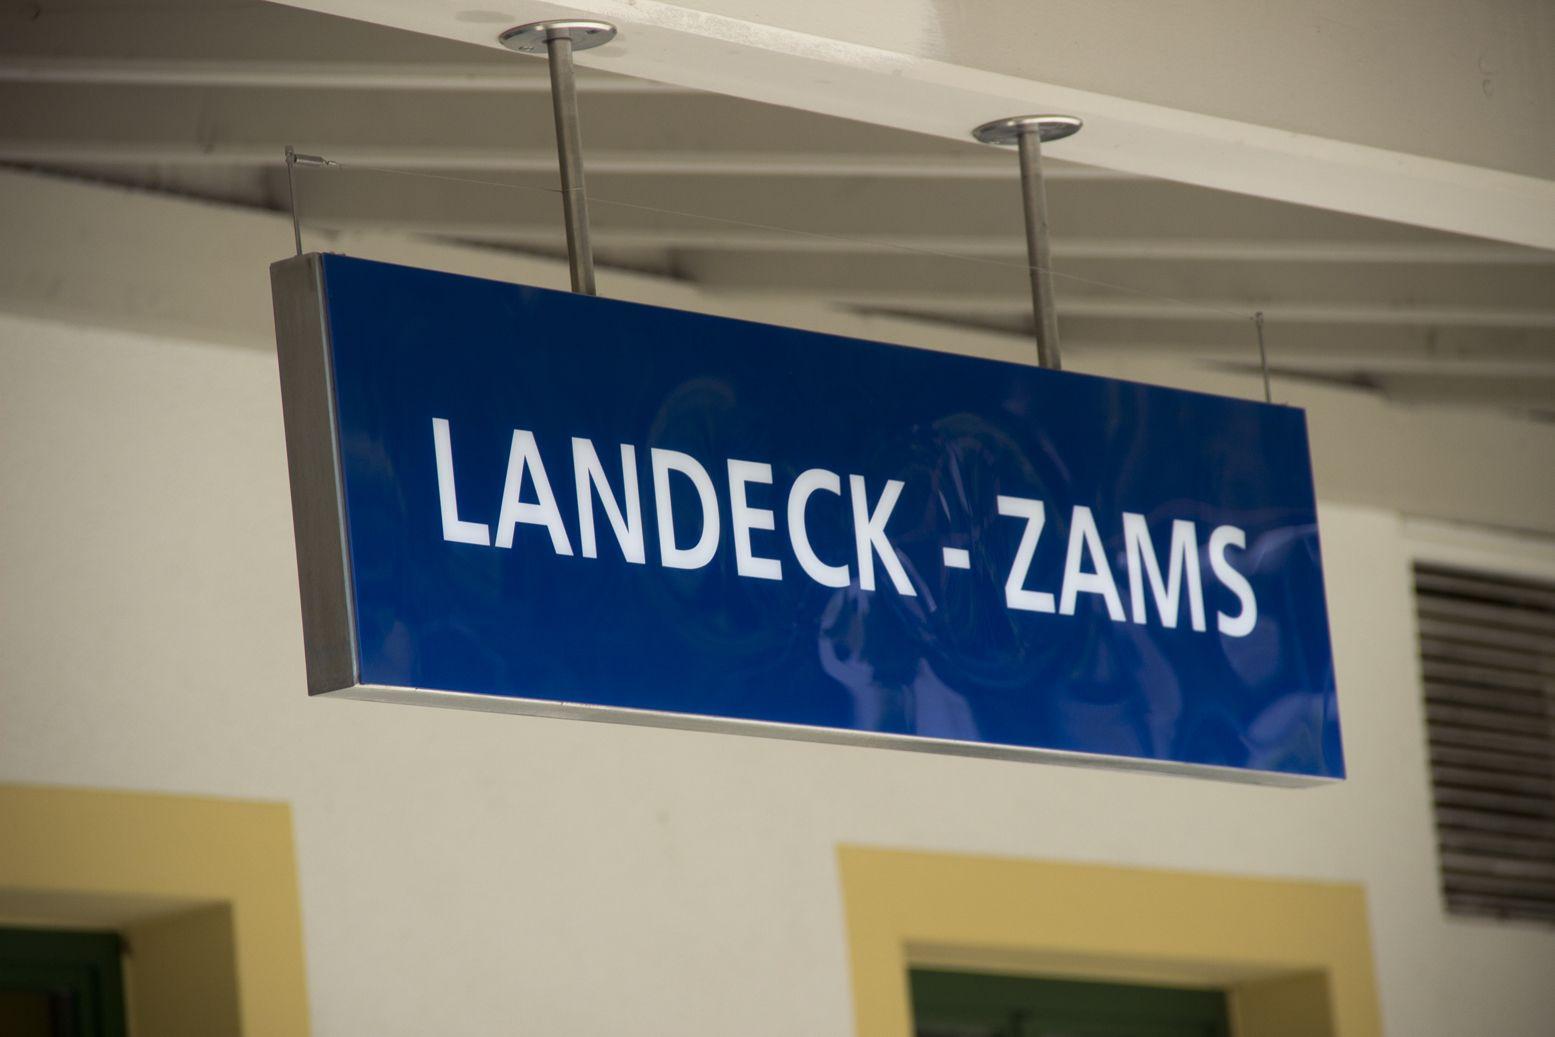 Landeck-Zams railway station